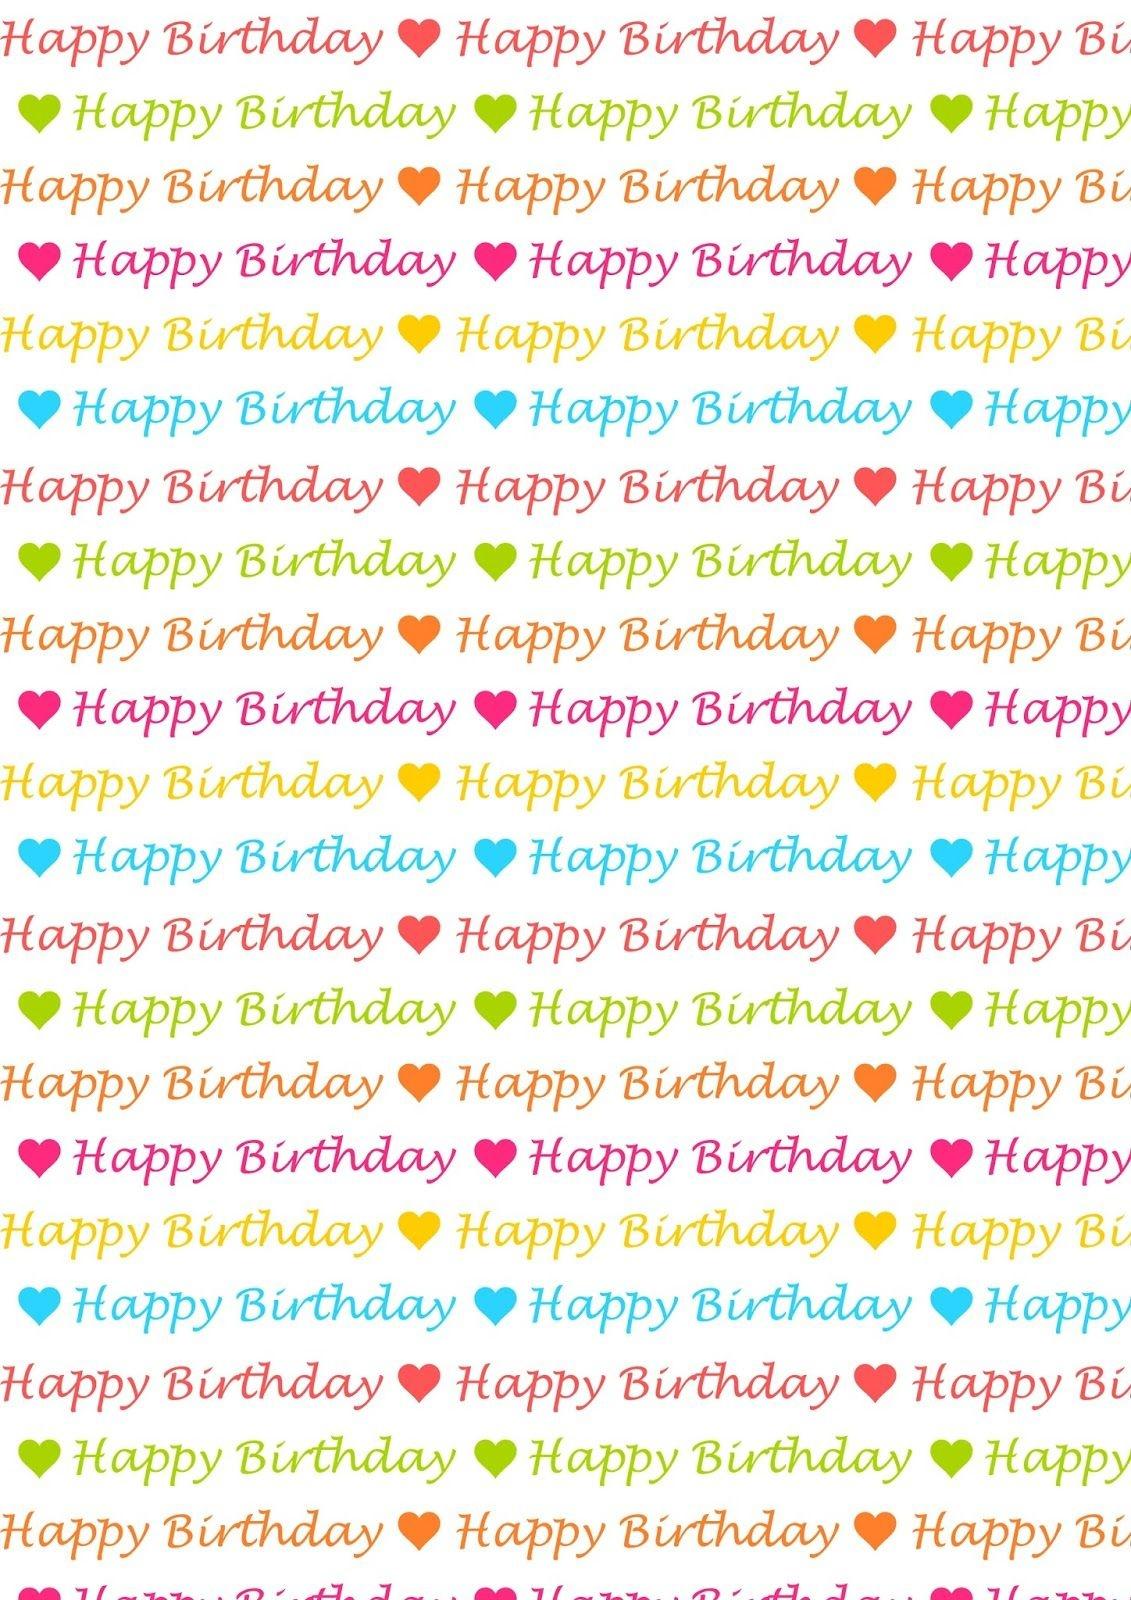 Free Digital Birthday Scrapbooking Paper - Ausdruckbares - Free Online Digital Scrapbooking Printable